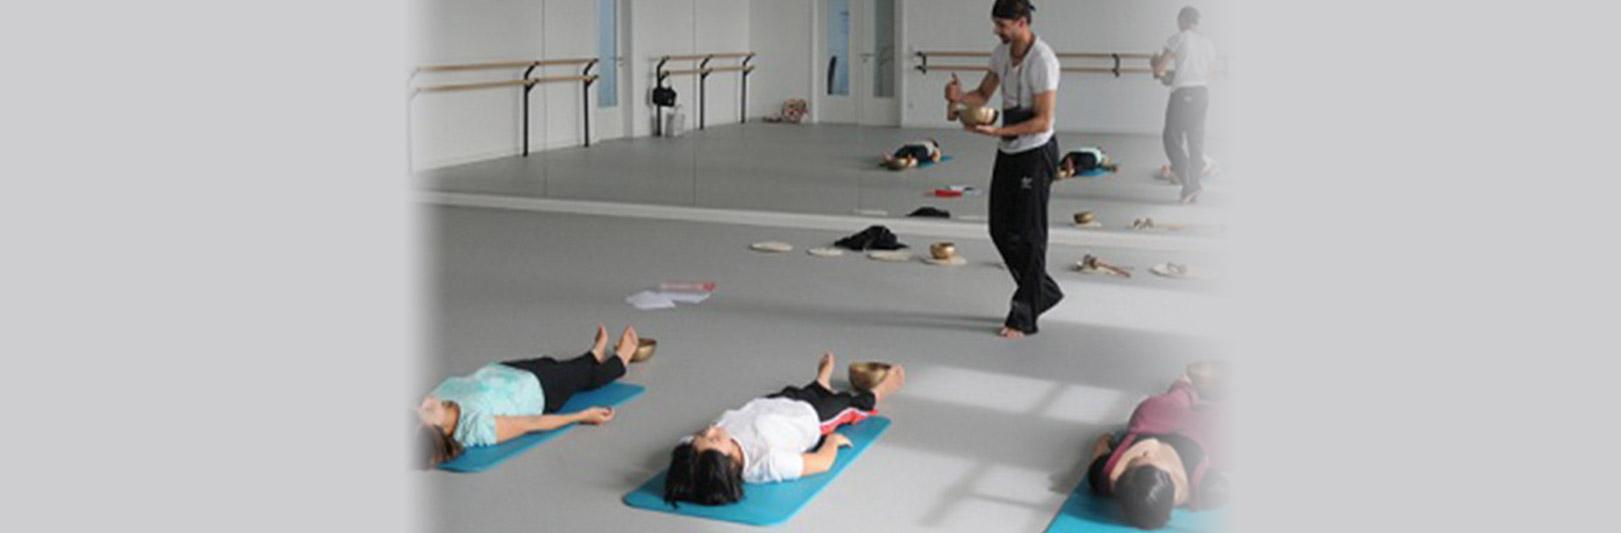 bodywork tanzschule kurse muenchen header - Body Work Out